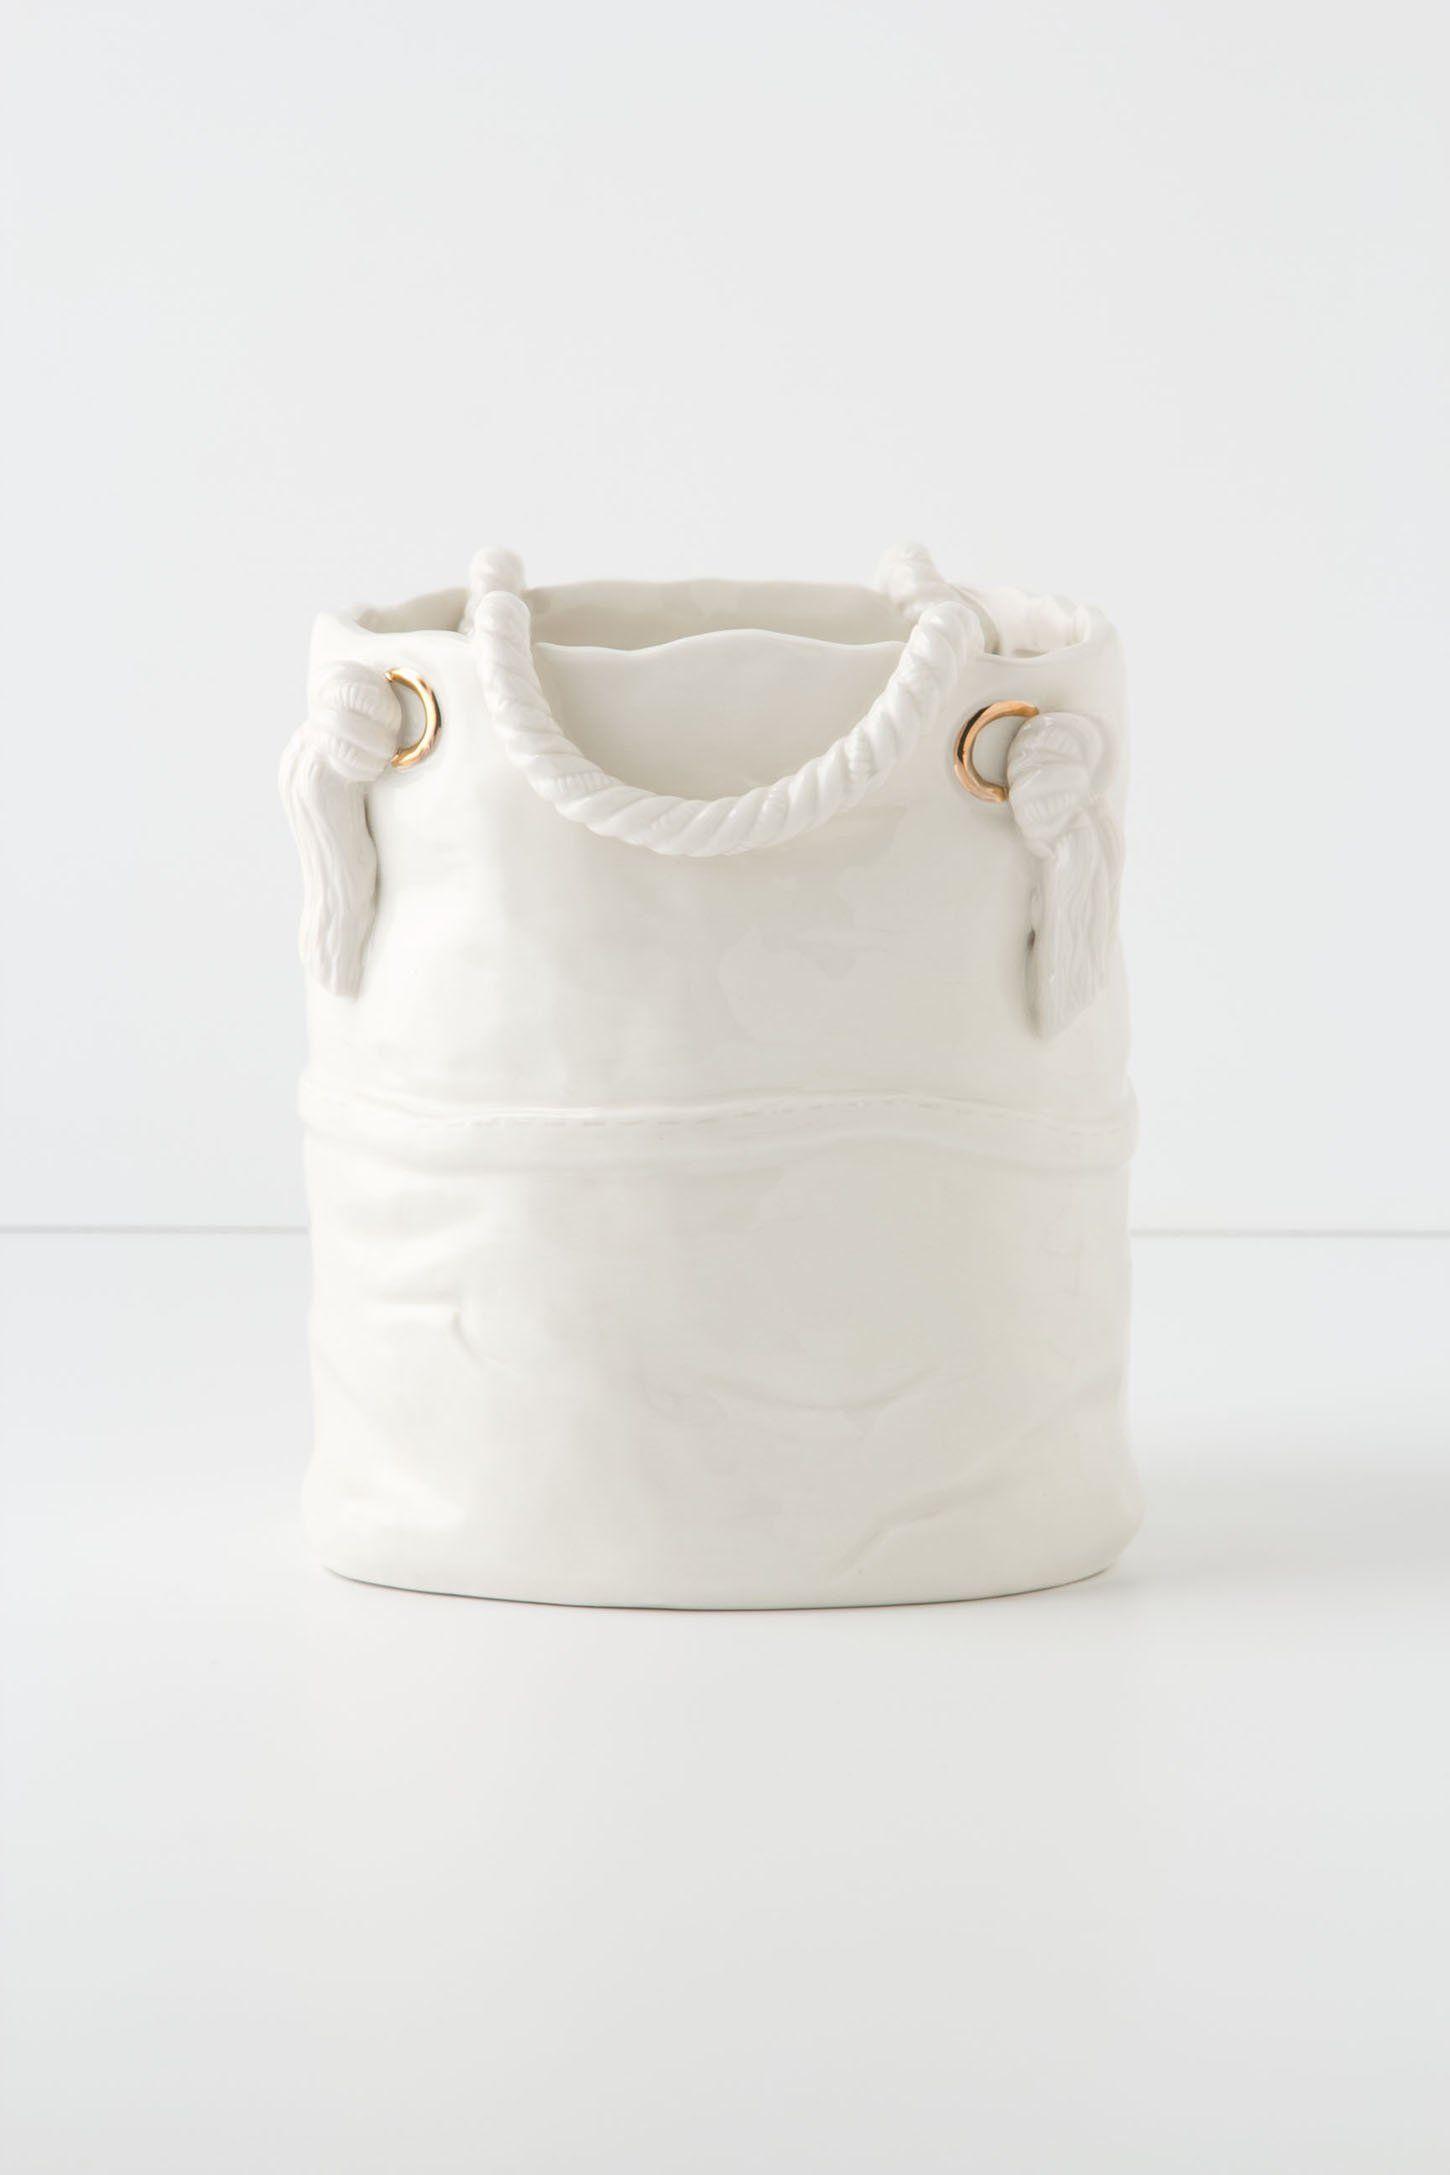 Cargo & Crinkle Champagne Bucket - Anthropologie.com